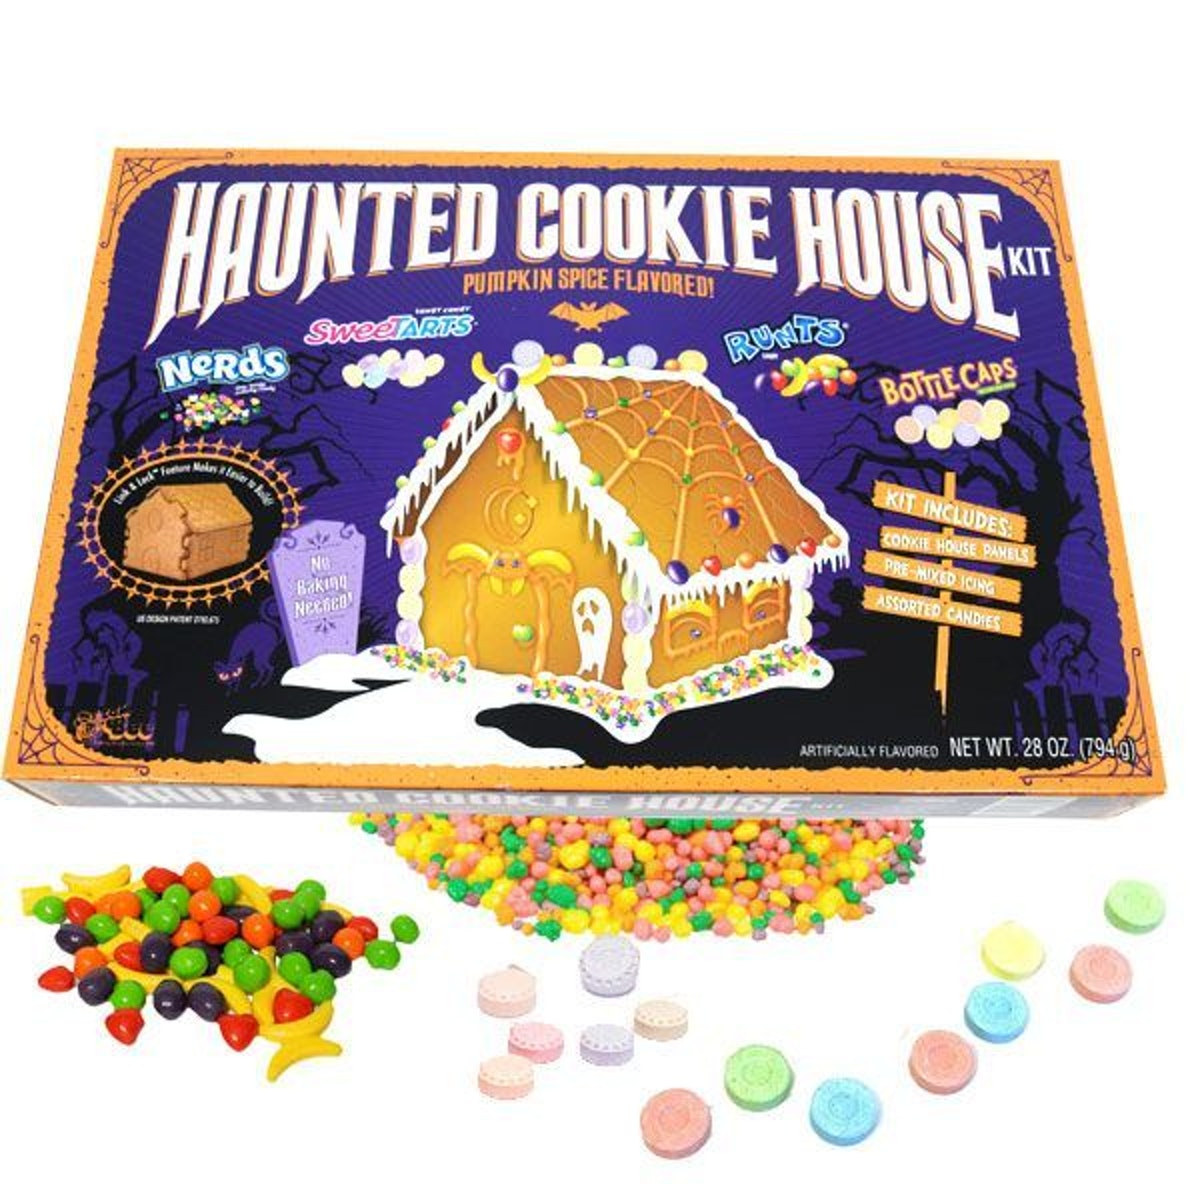 Wonka Haunted Cookie House Kit